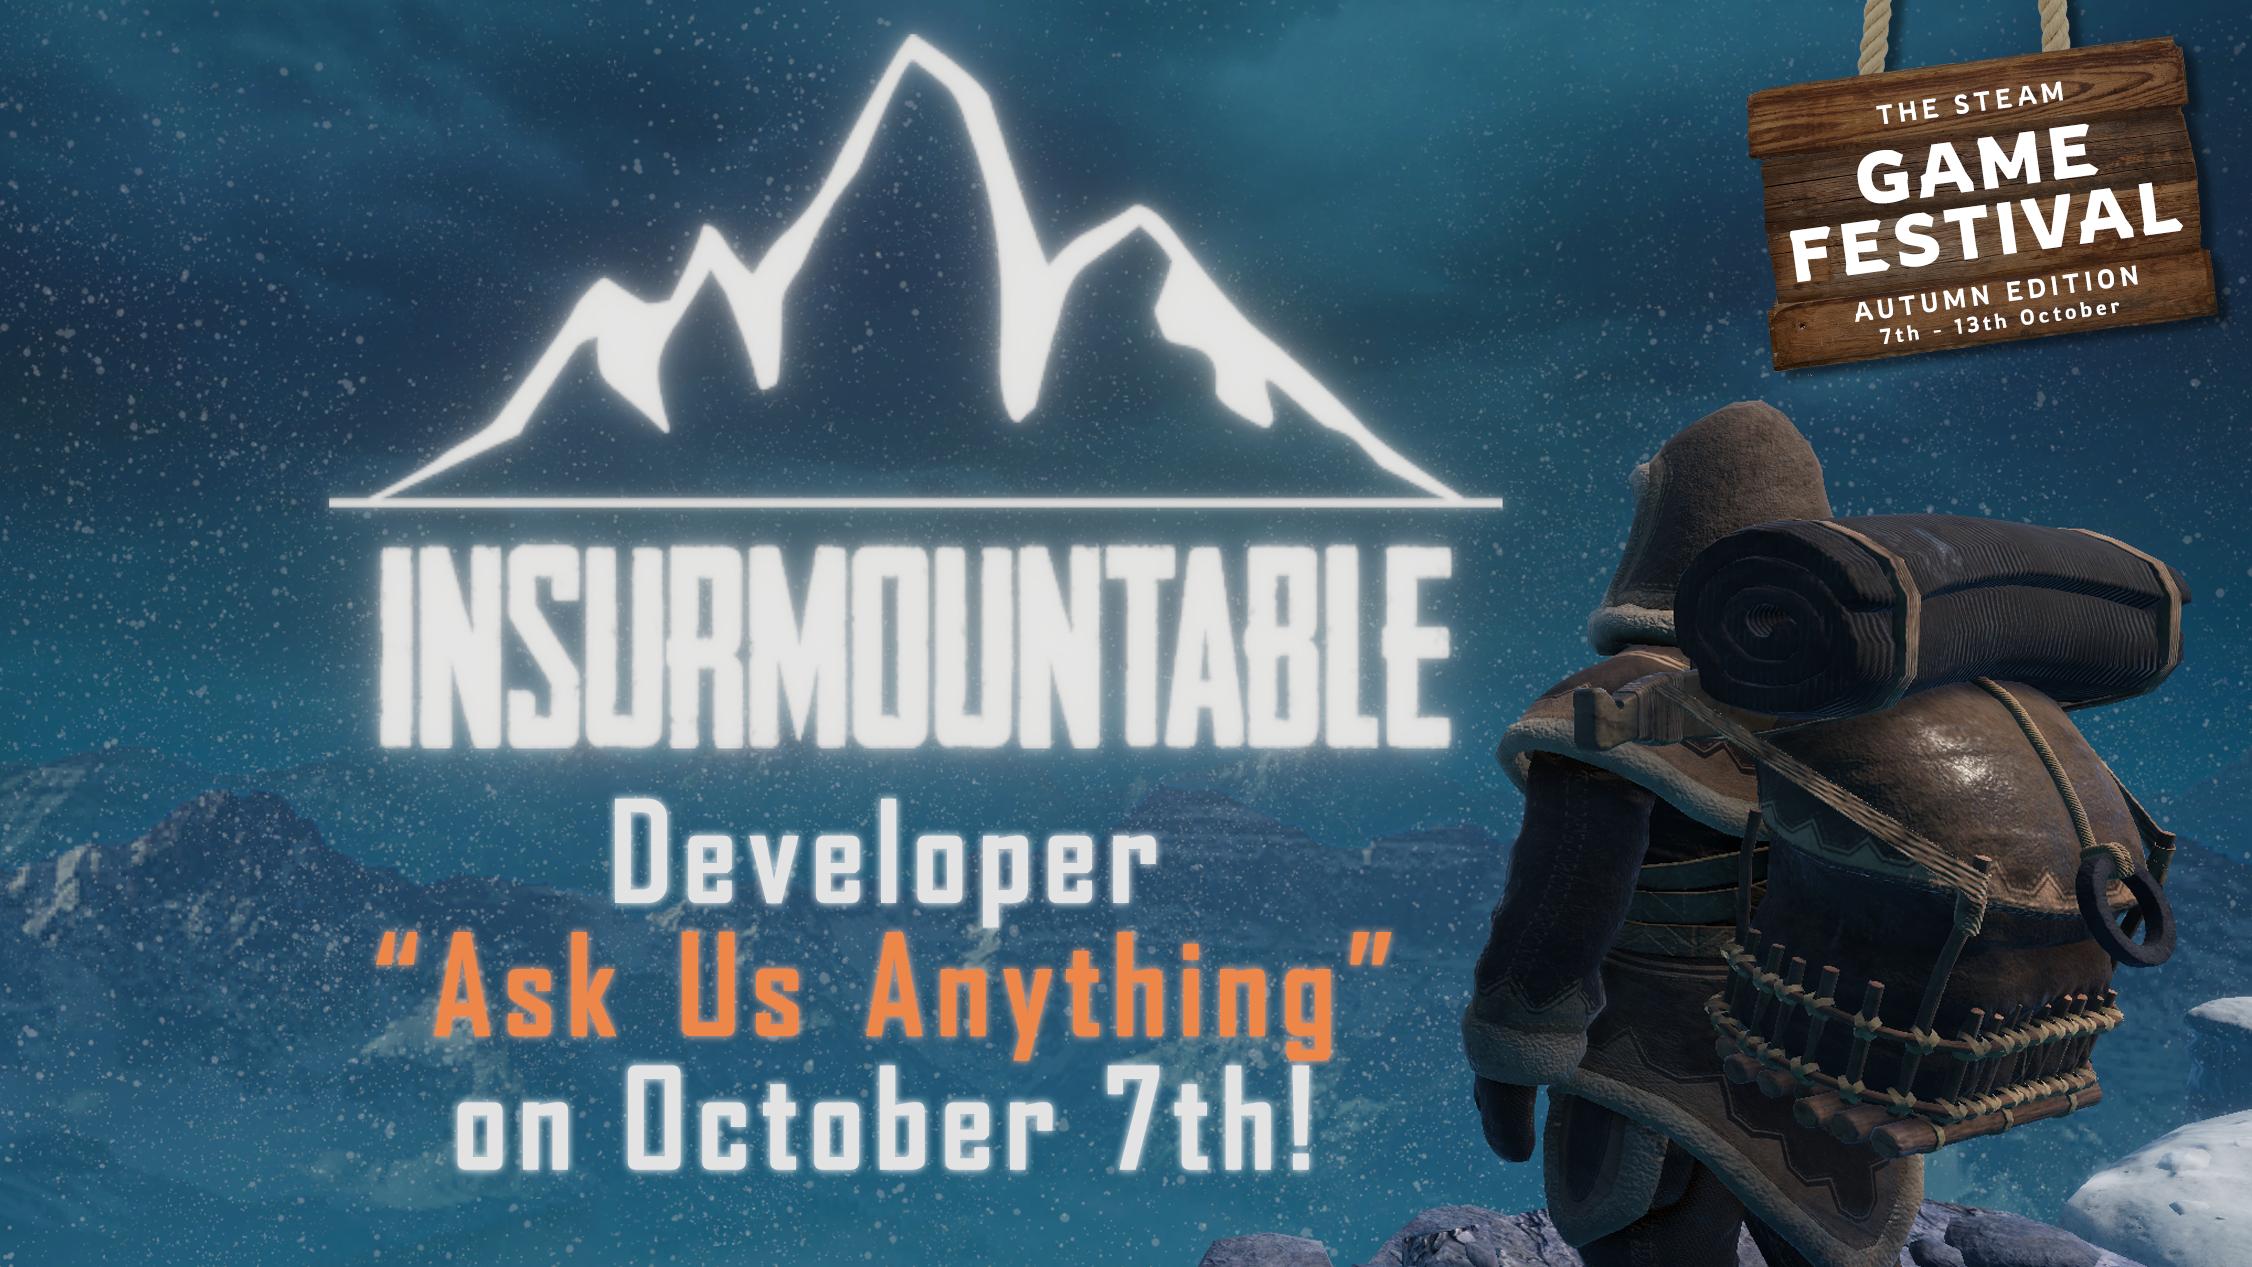 Developer Stream on october 7th